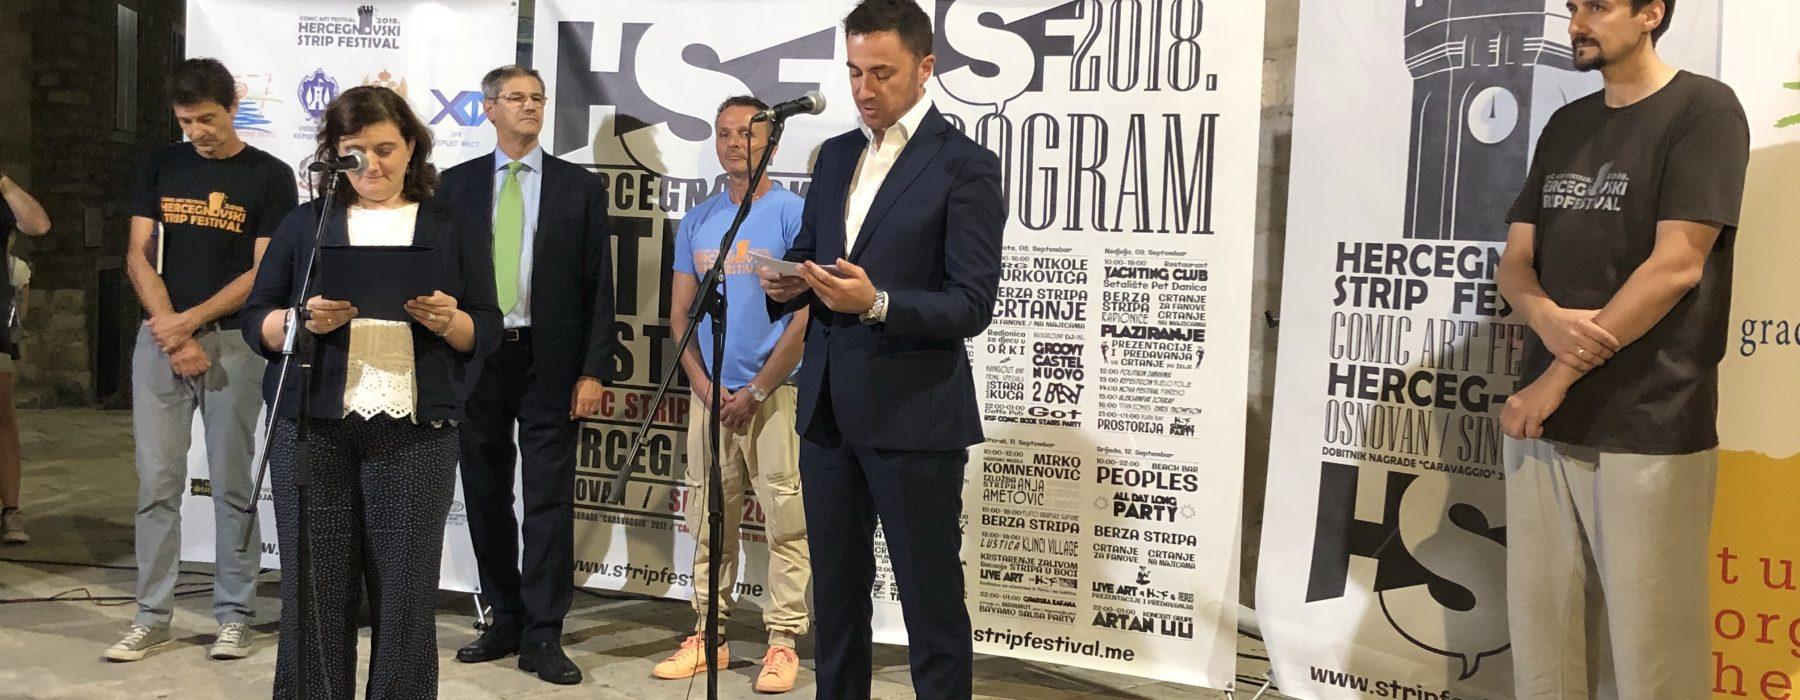 Hercegnovski strip festival bogatiji nego ikad